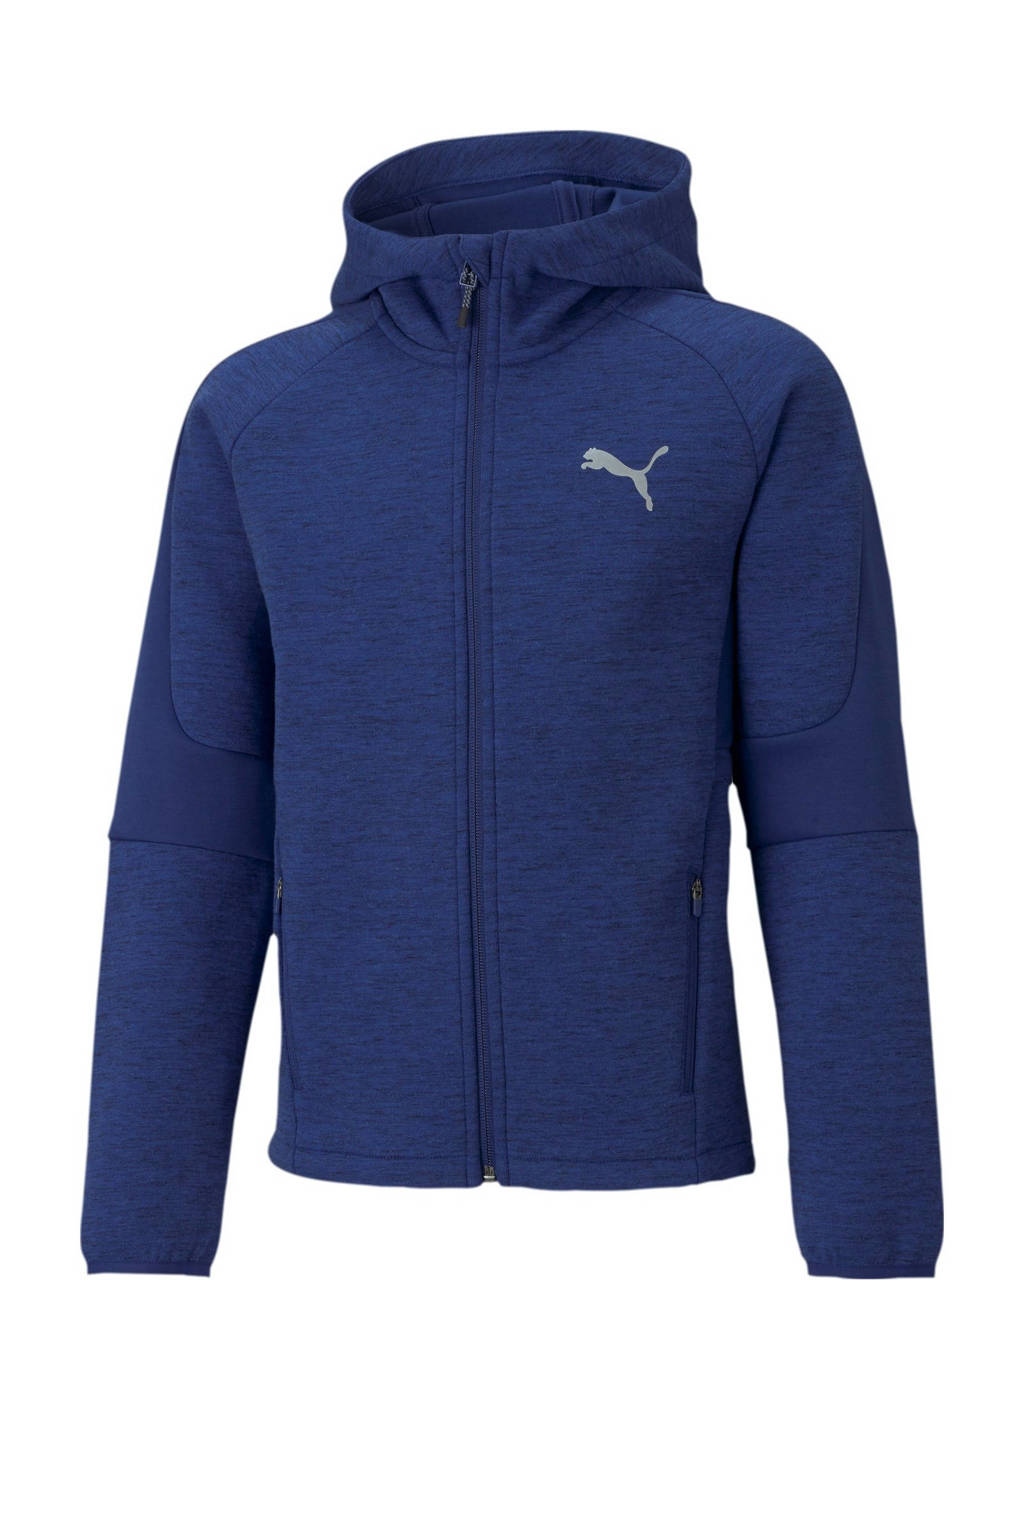 Puma vest donkerblauw, Donkerblauw